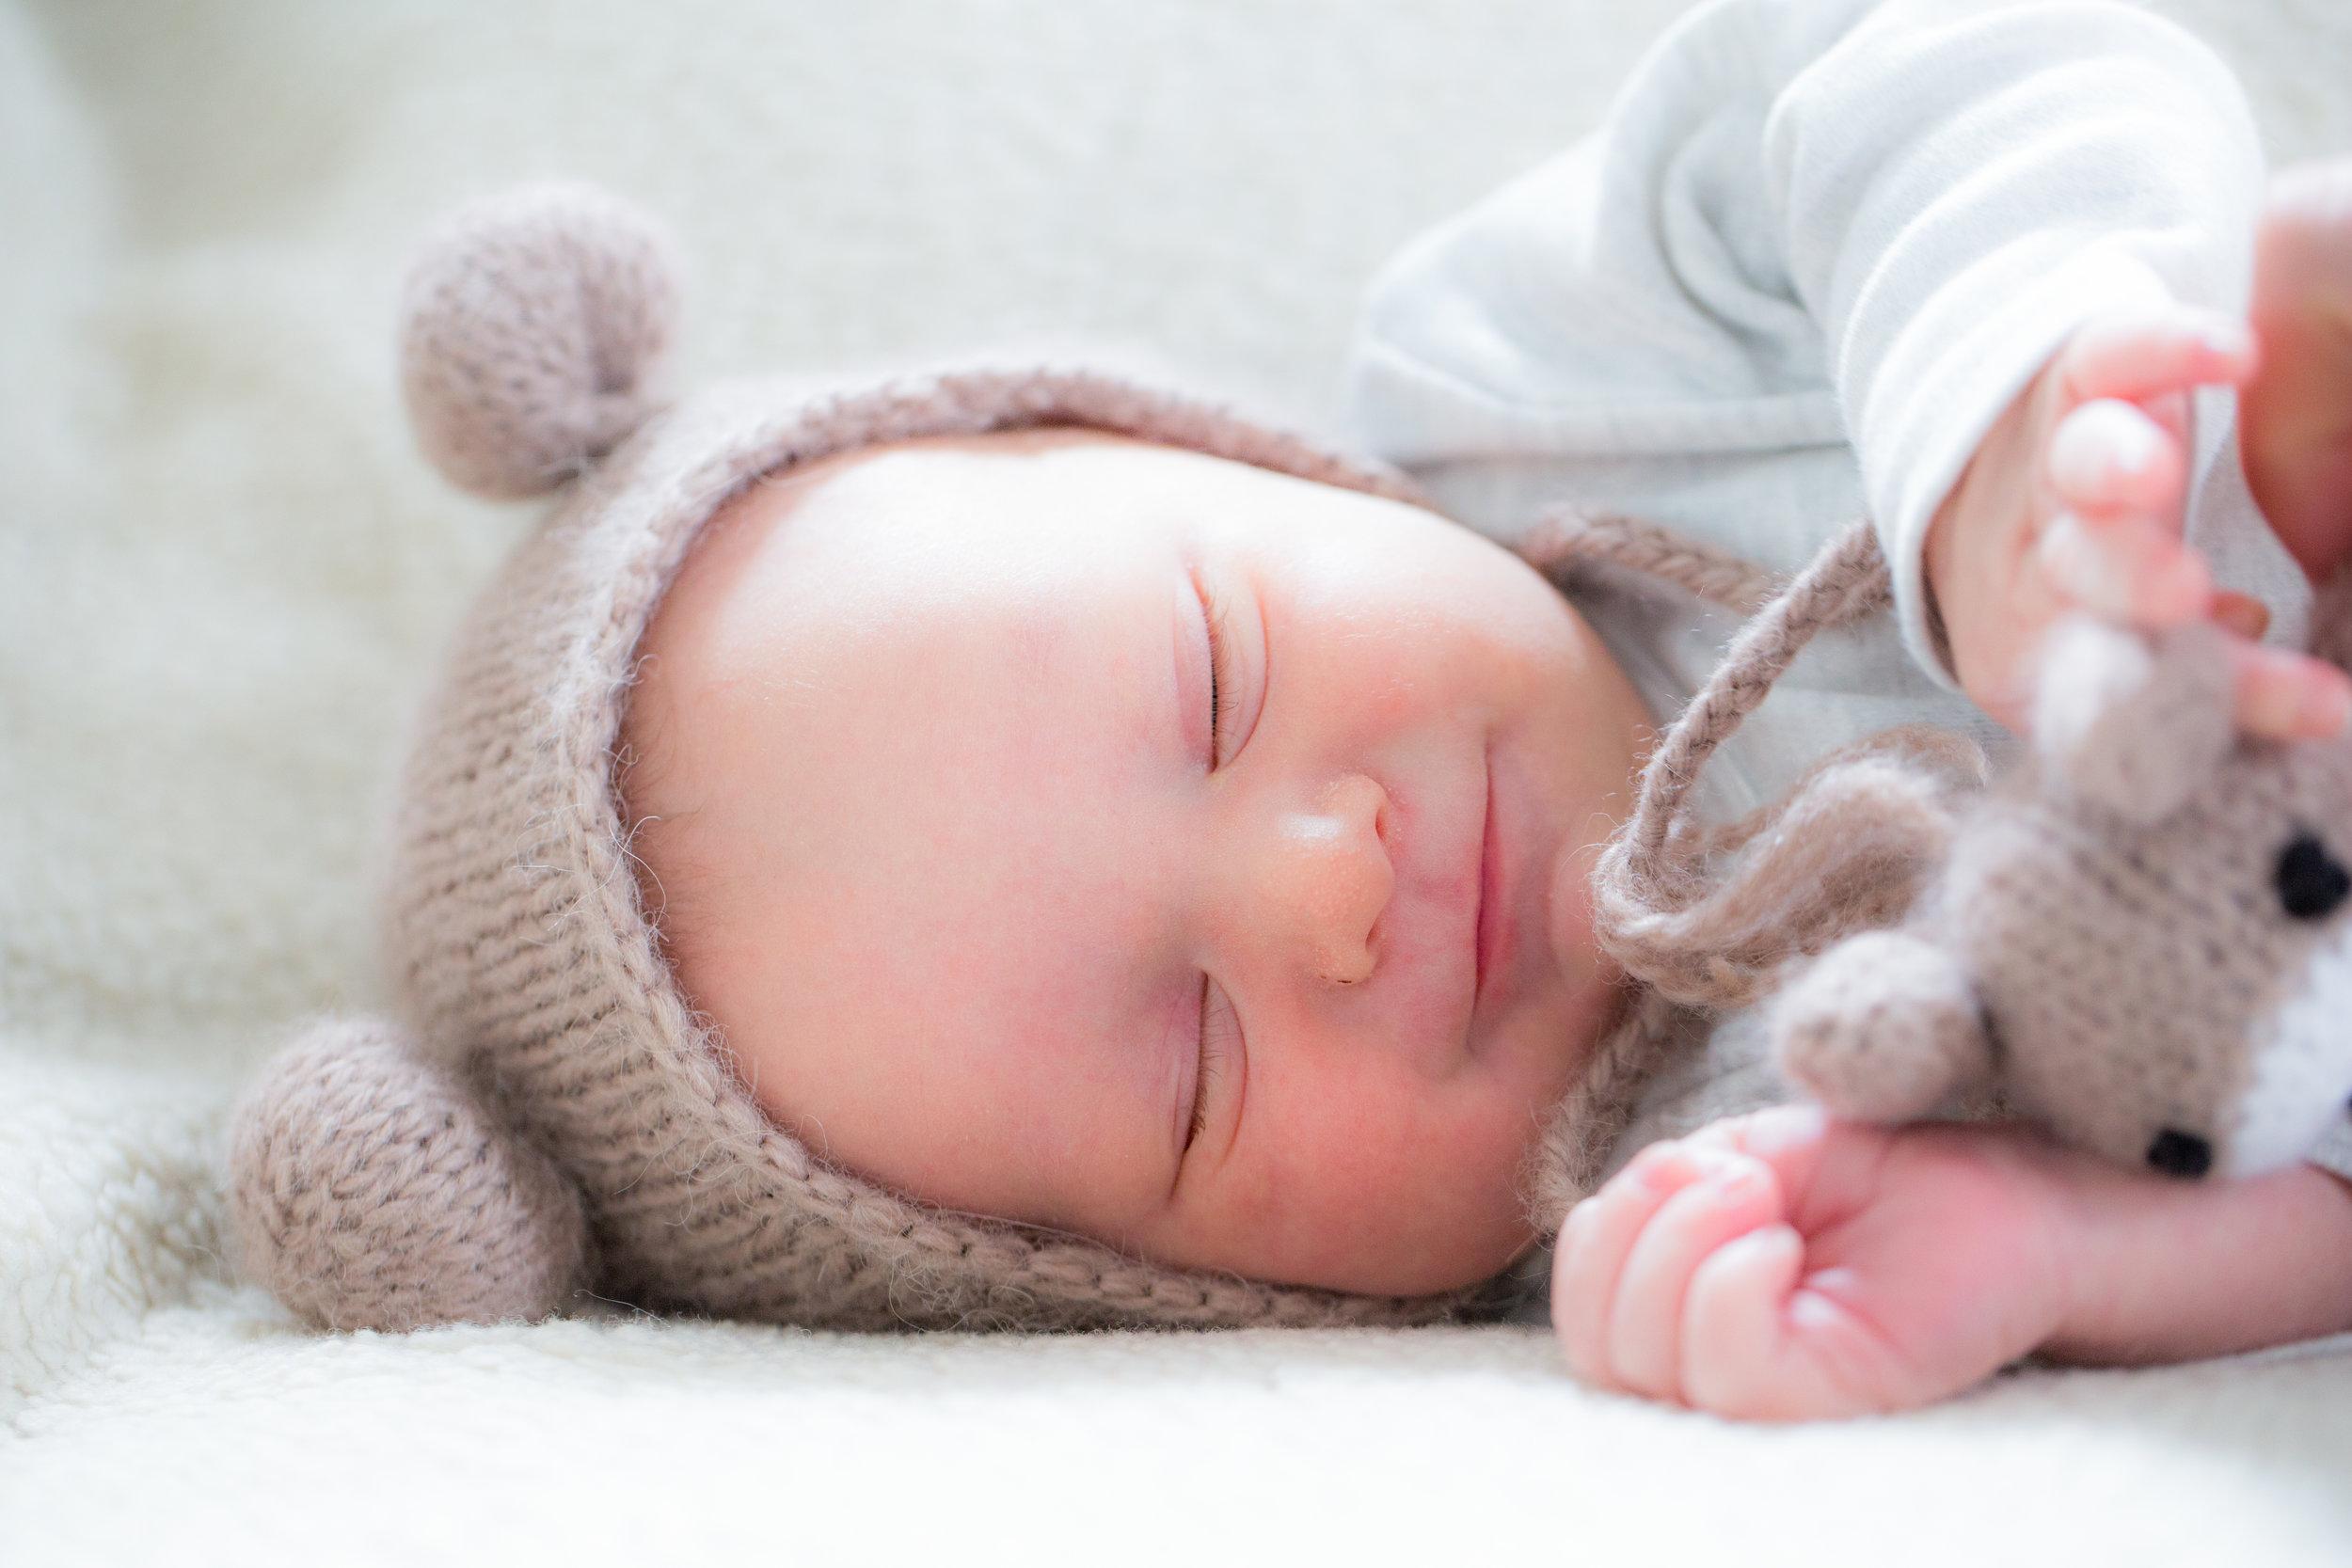 JJ-Ignotz-NYC-Photographer-babies_005.JPG